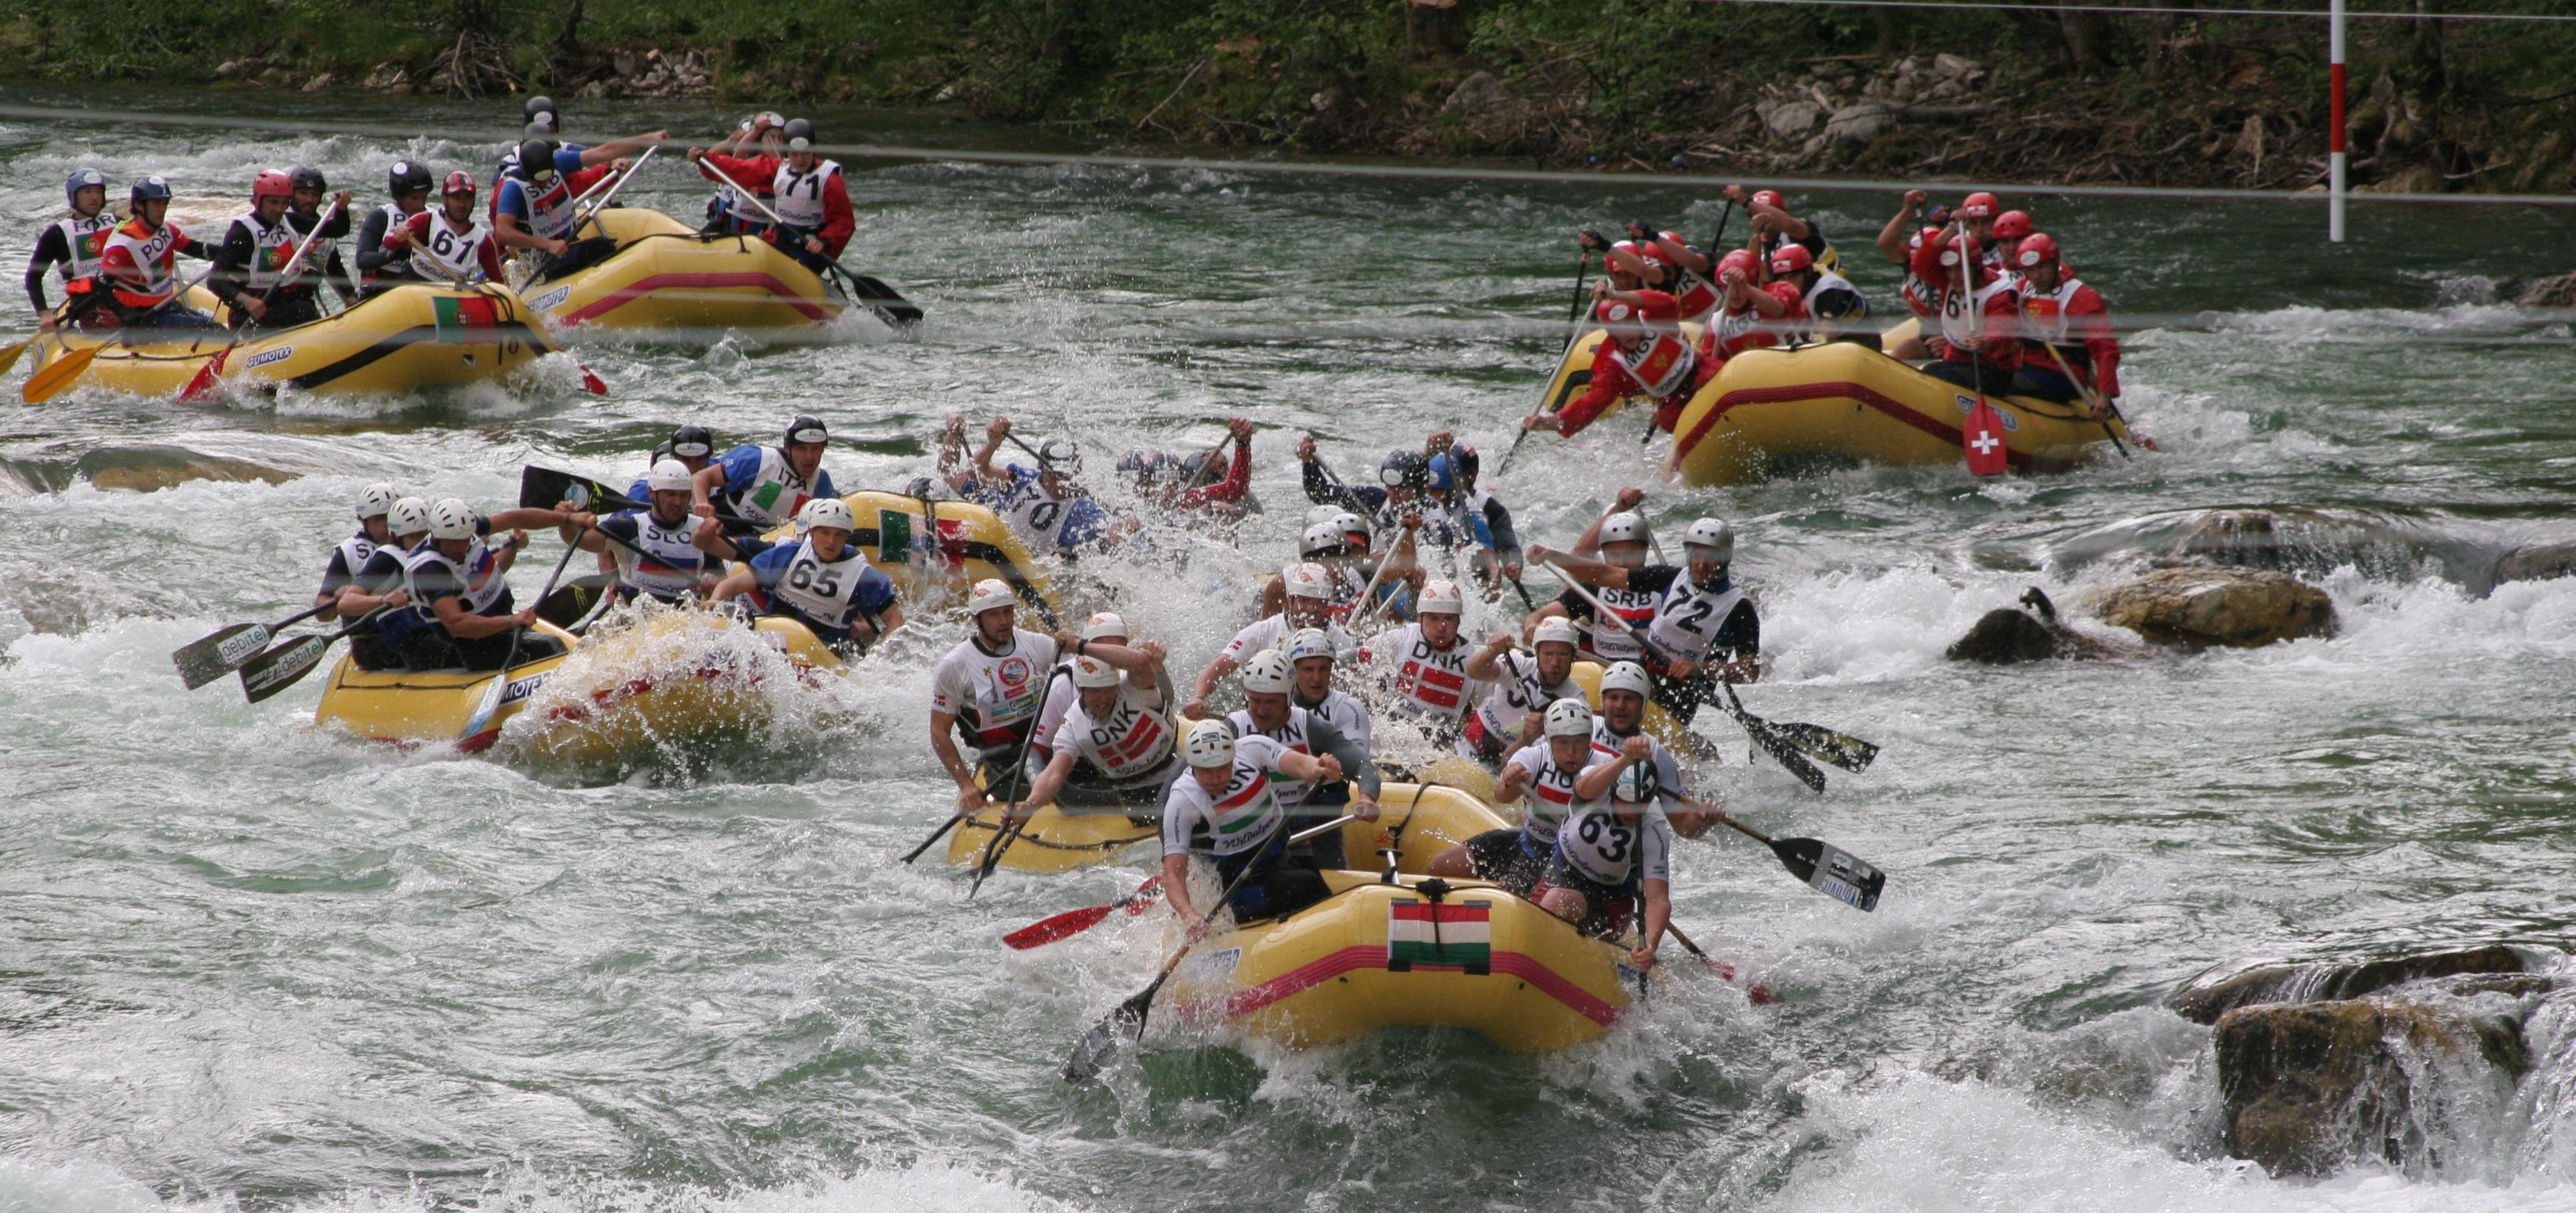 rafting-erc-2008-hungaroraft-csapatepito-program.JPG